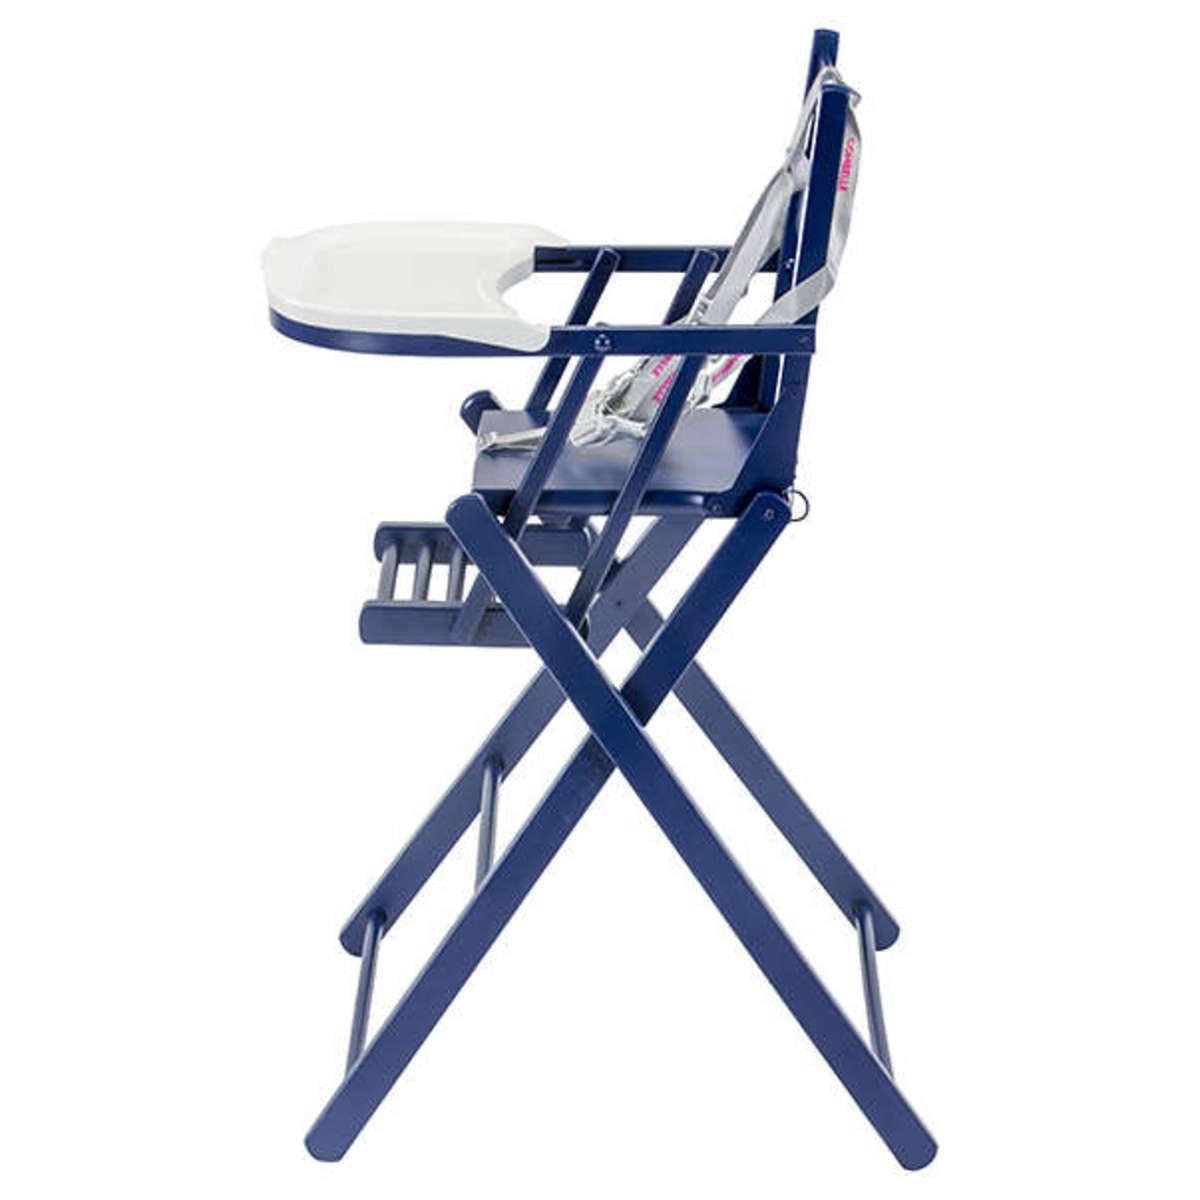 Chaise haute pliante laqu 233 28 images ikea chaise for Chaise haute combelle